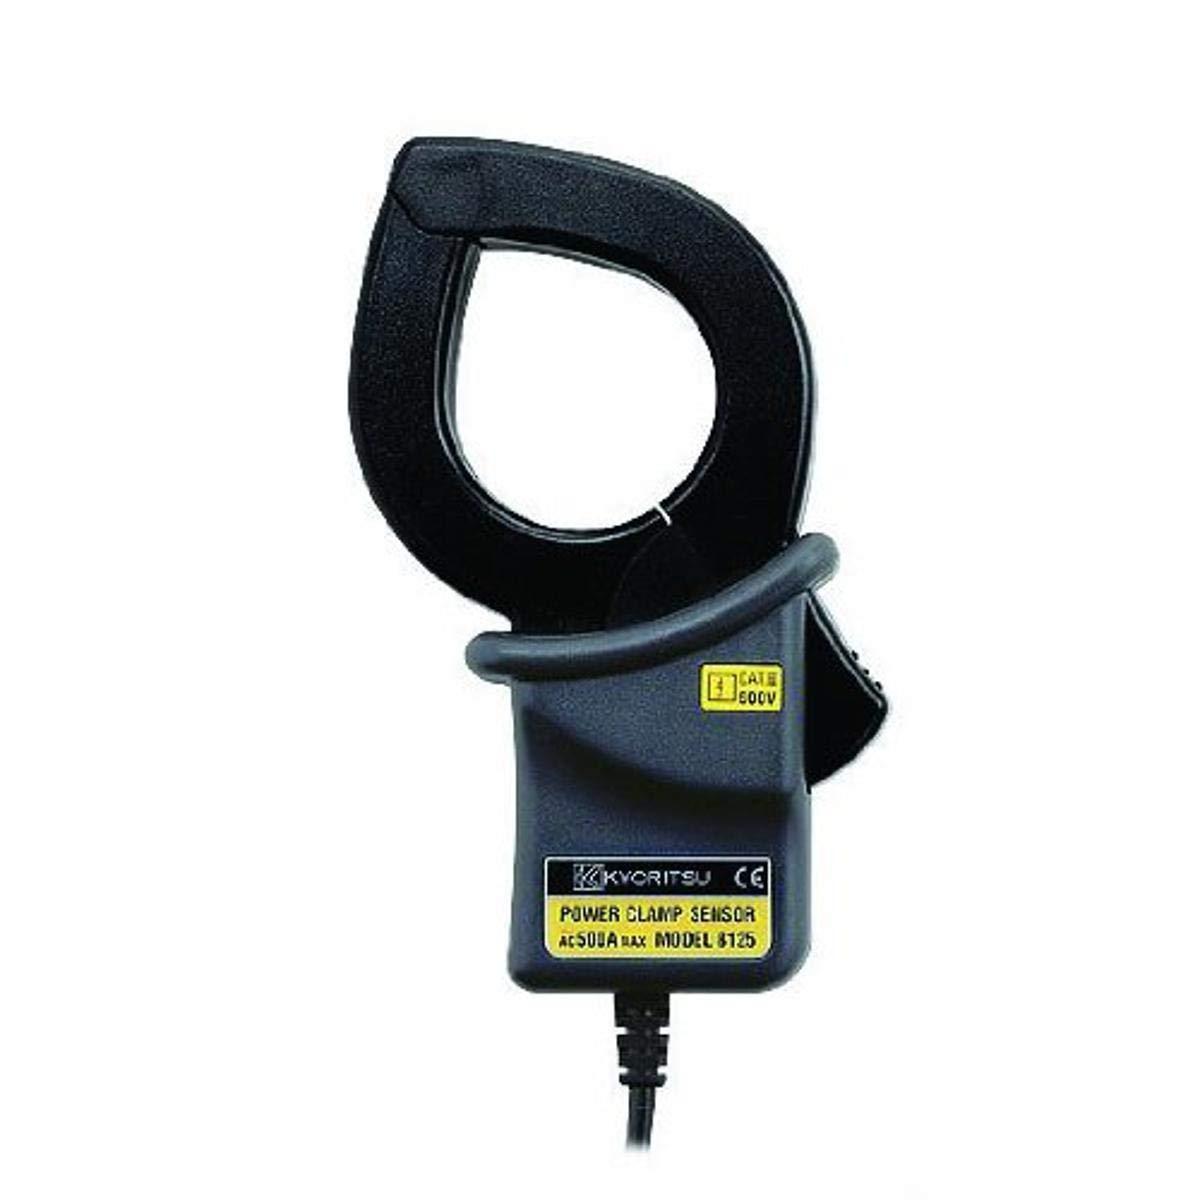 Kyoritsu 8125 AC Load Current Clamp Sensor, 500Amp, 40mm Conductor